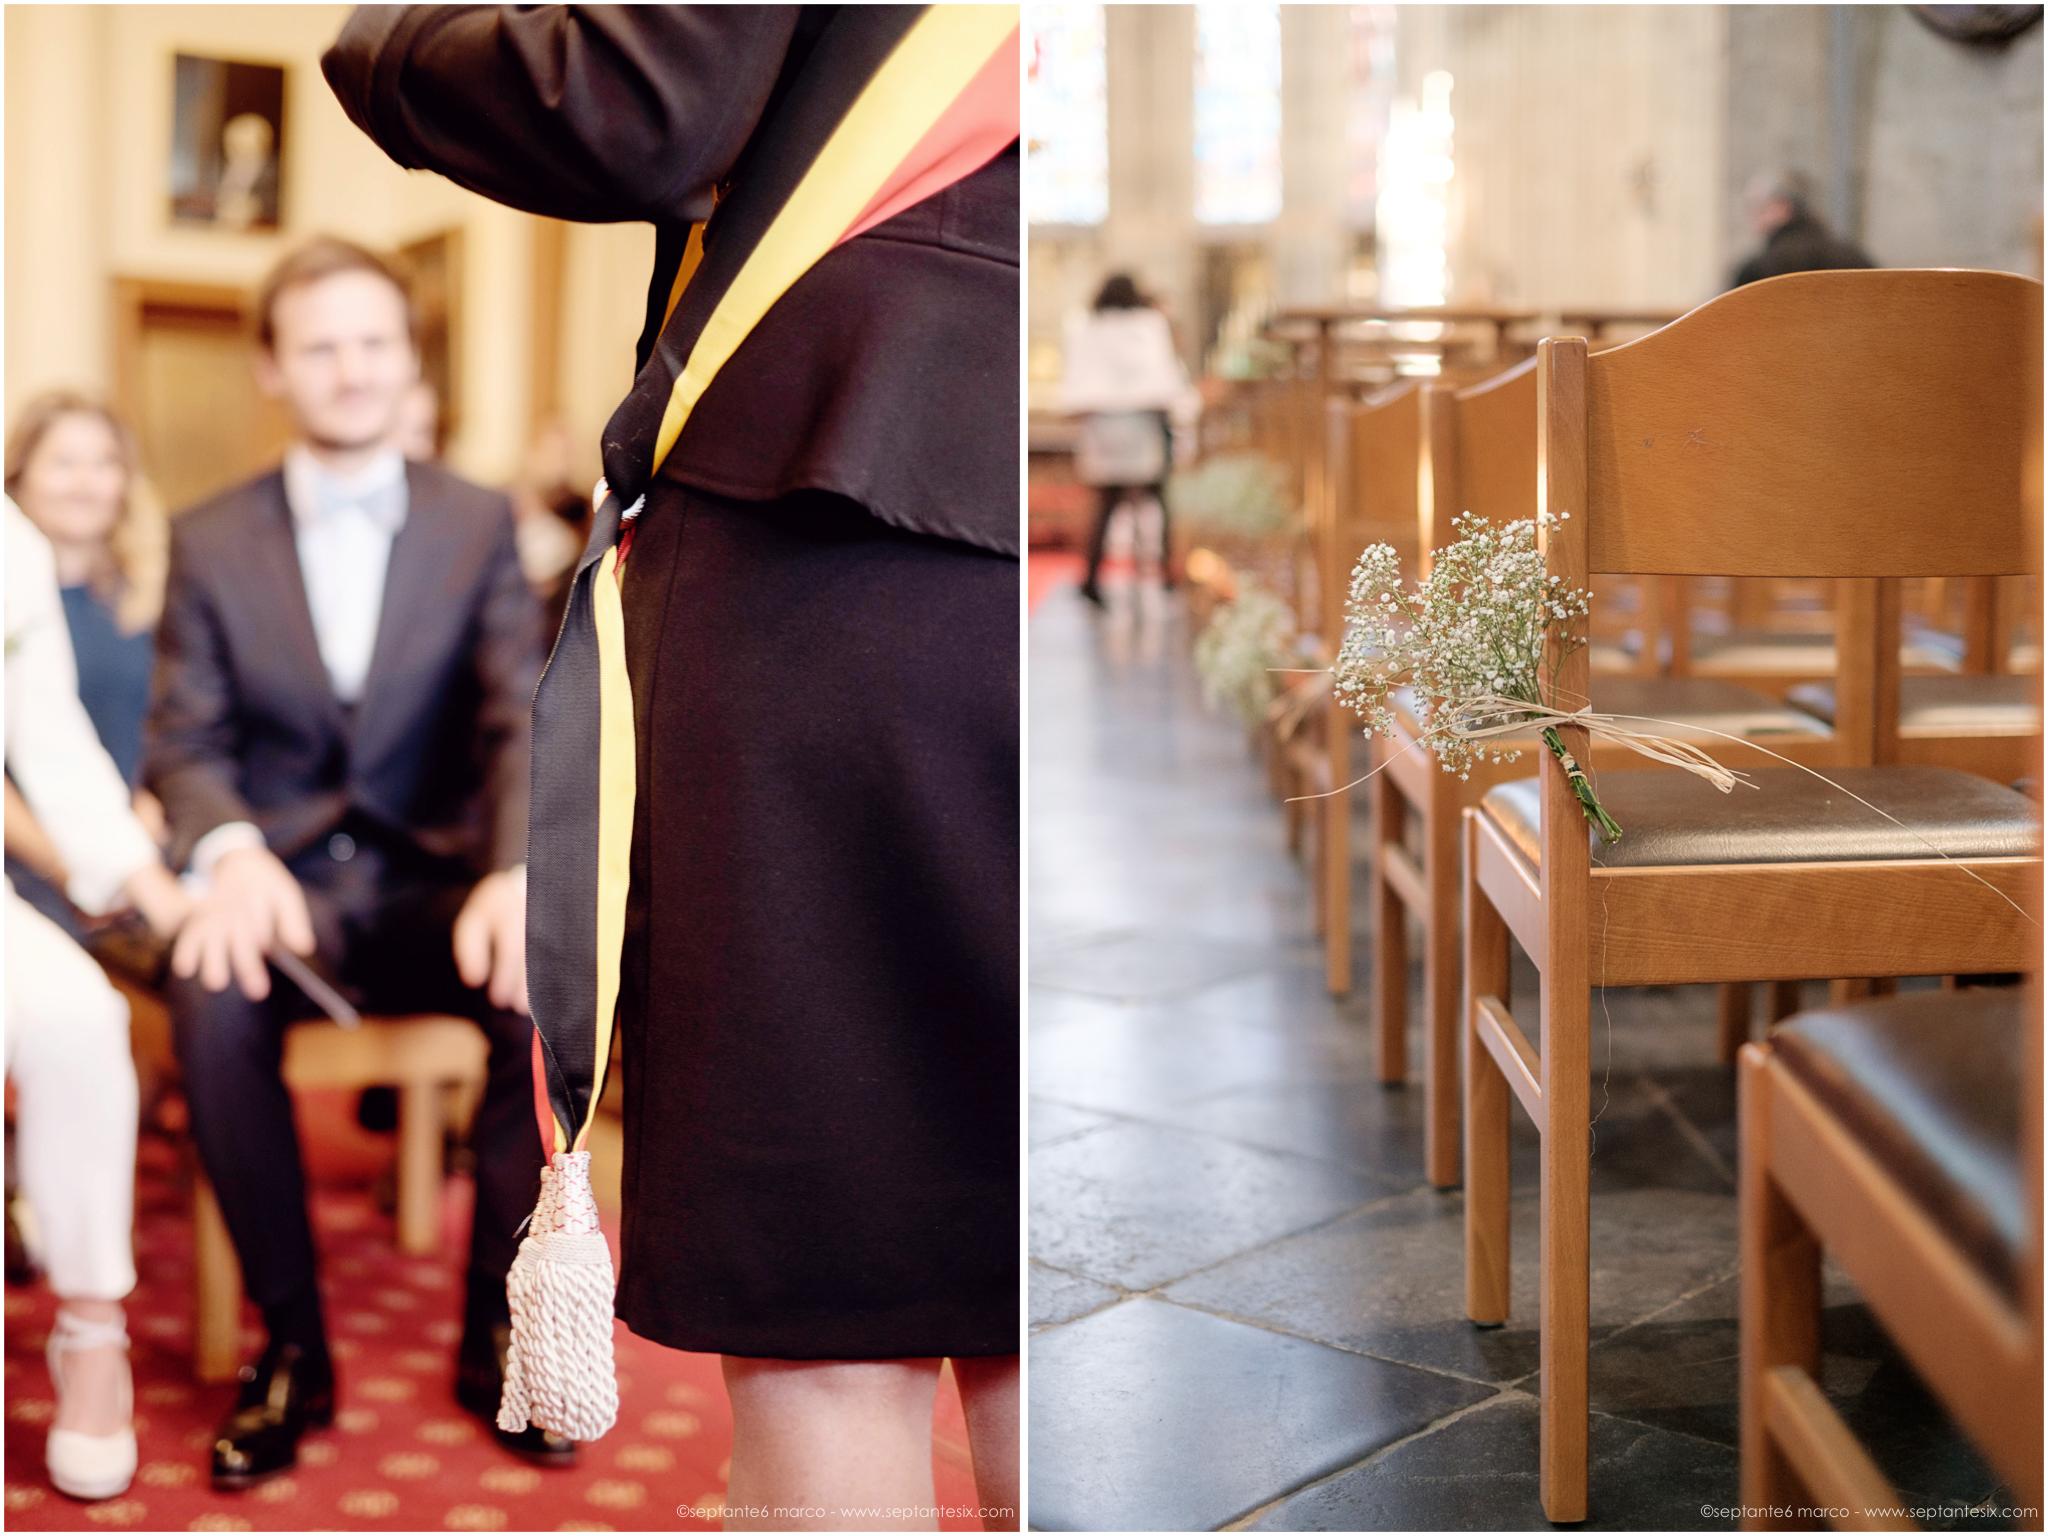 16 00 OB 0319 P wedding photographer brussels-06